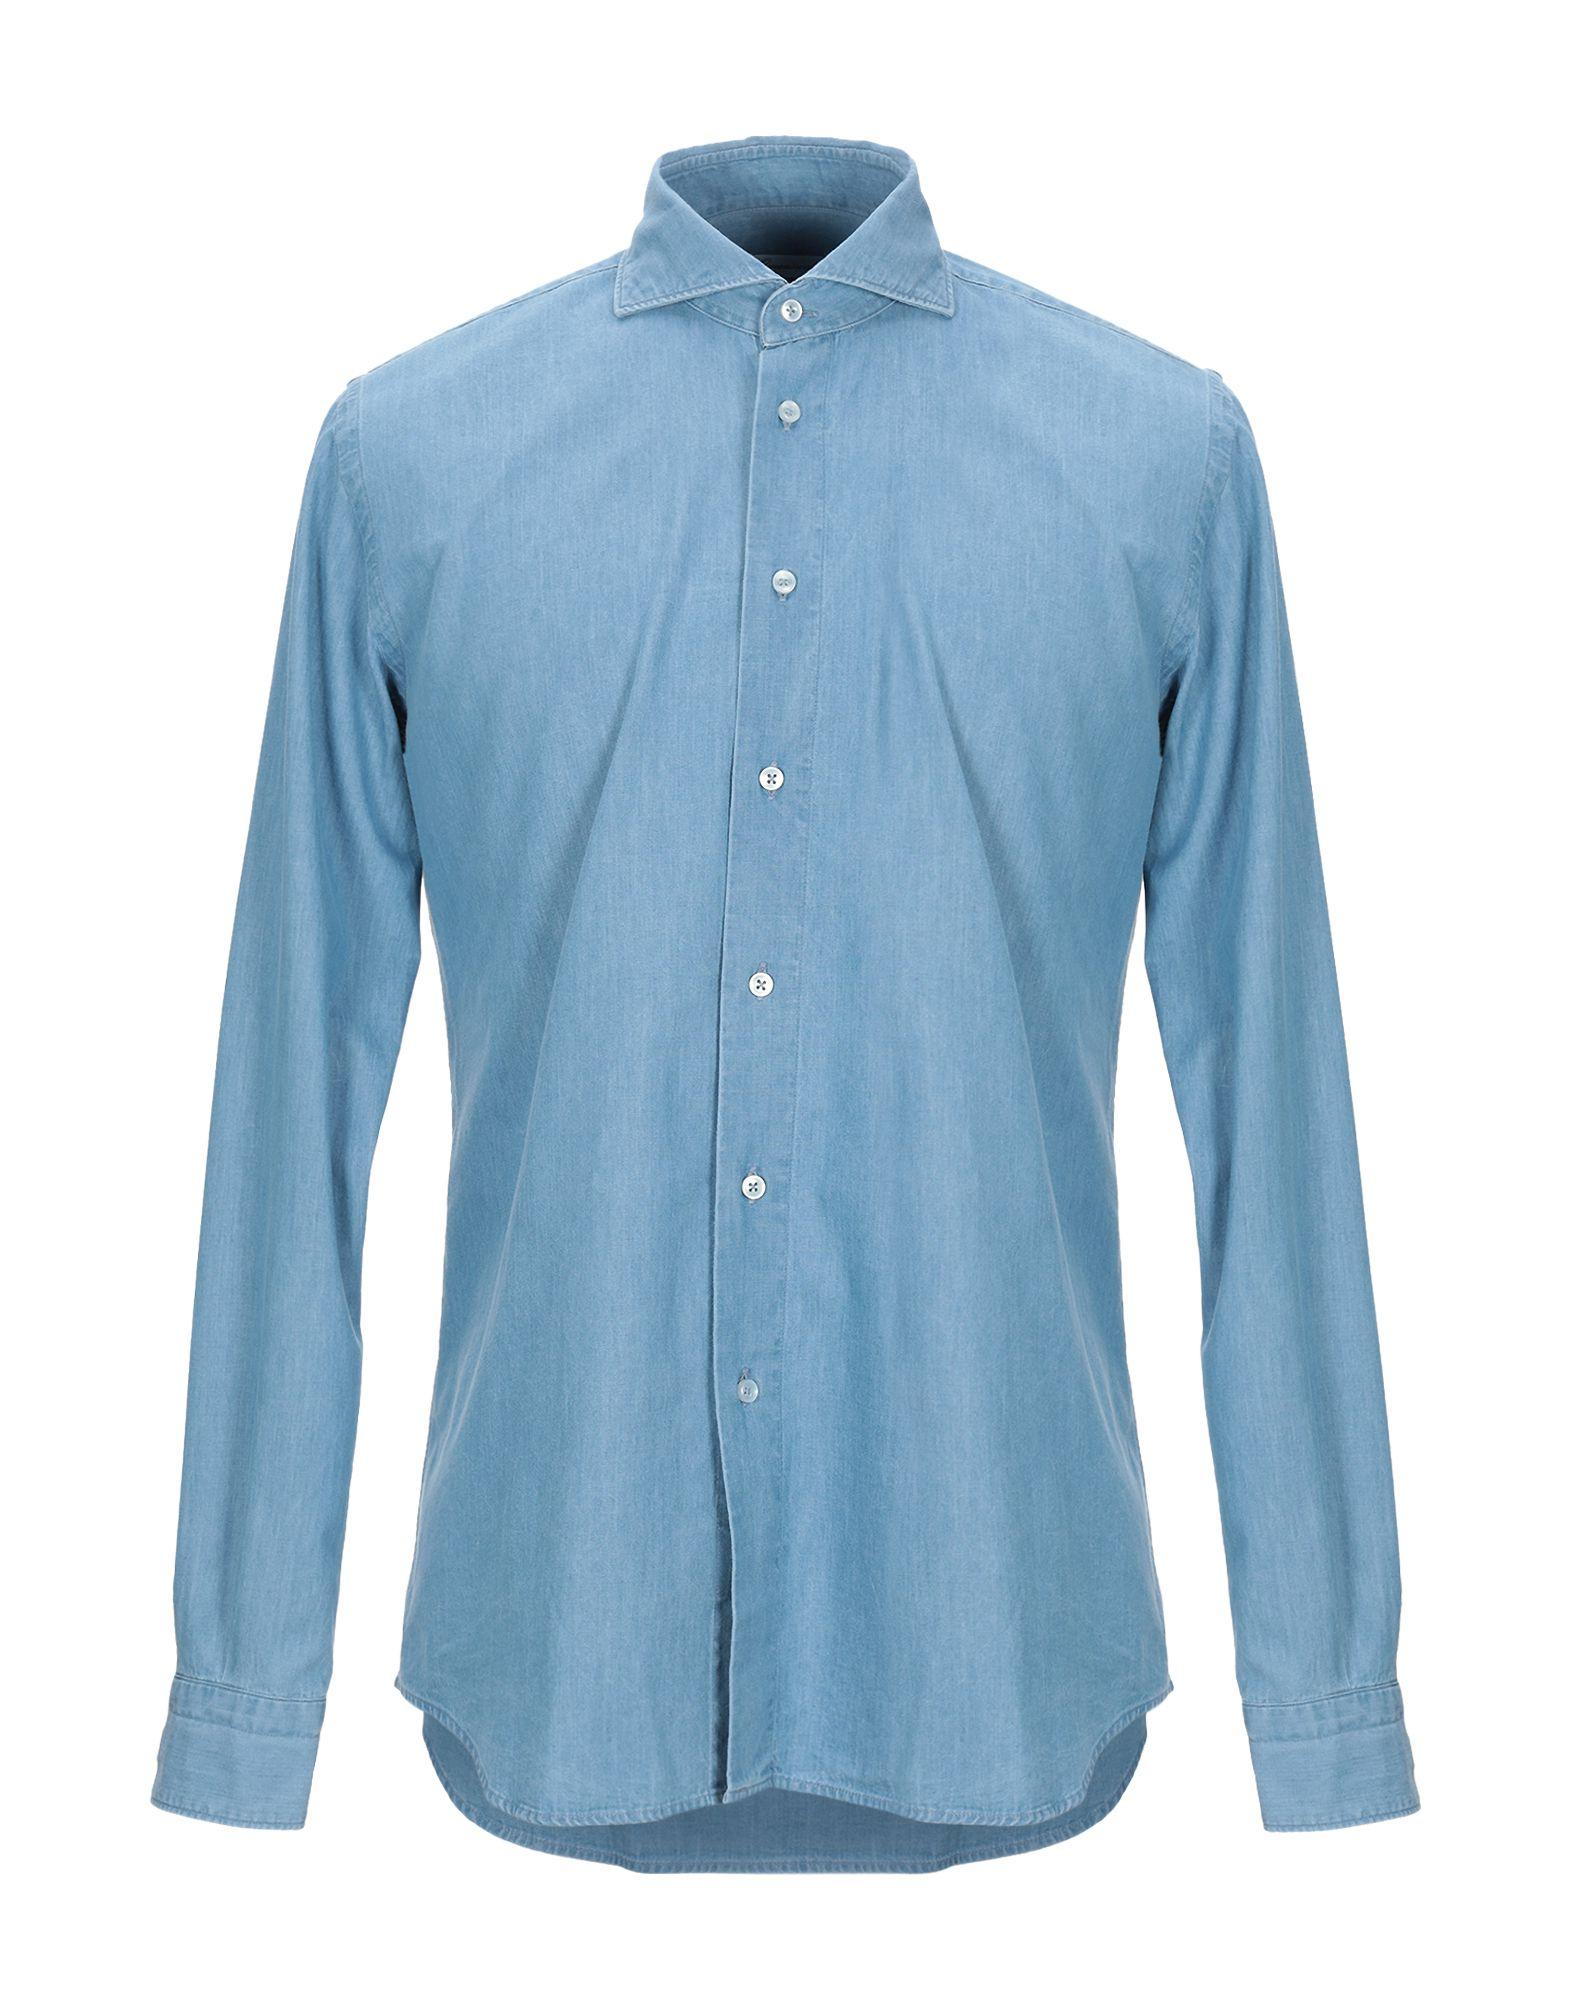 QUEENSWAY Джинсовая рубашка